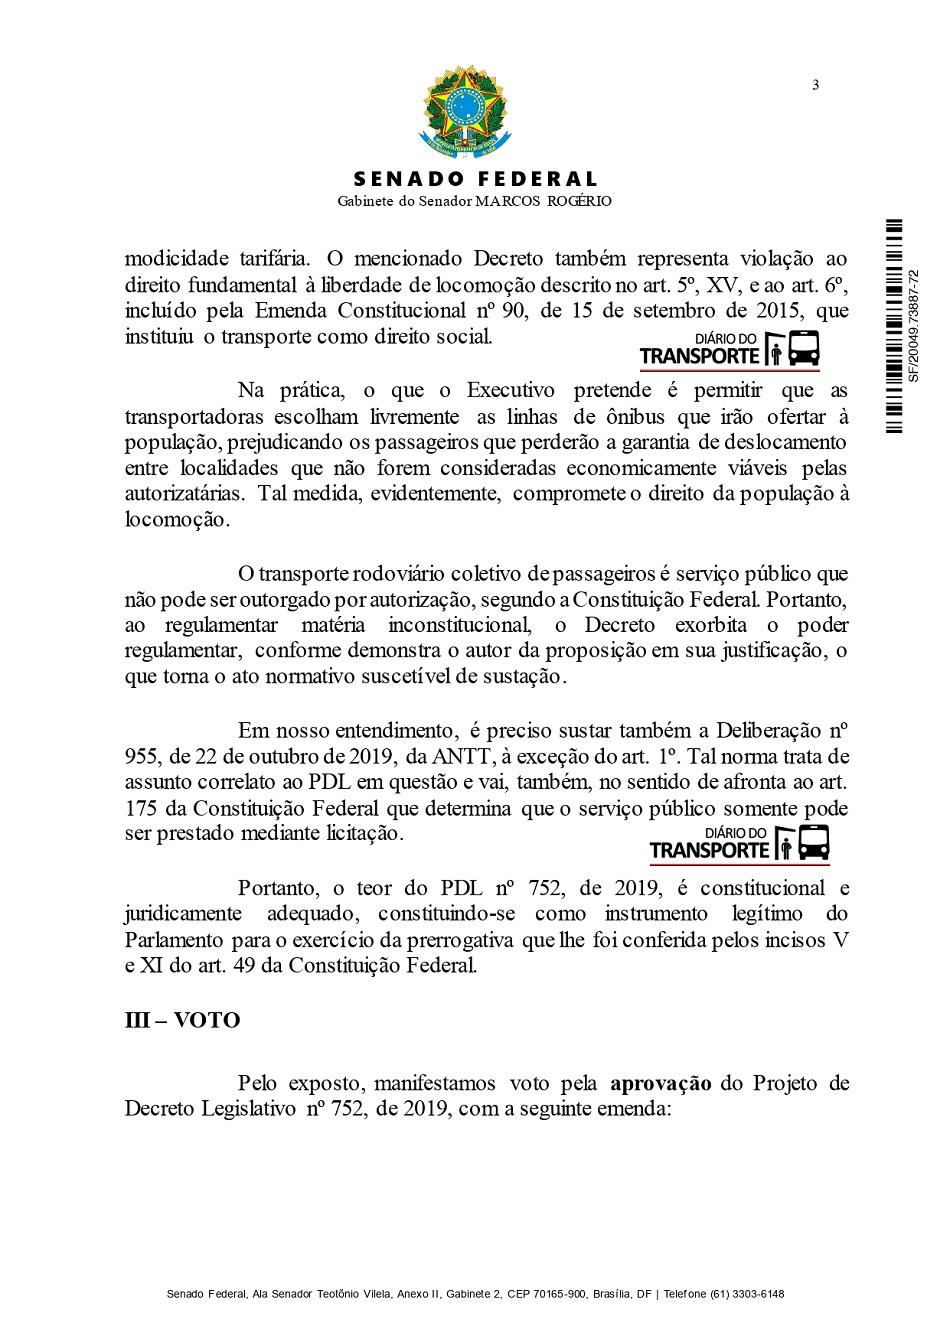 DOC- Voto do Relator_page-0003